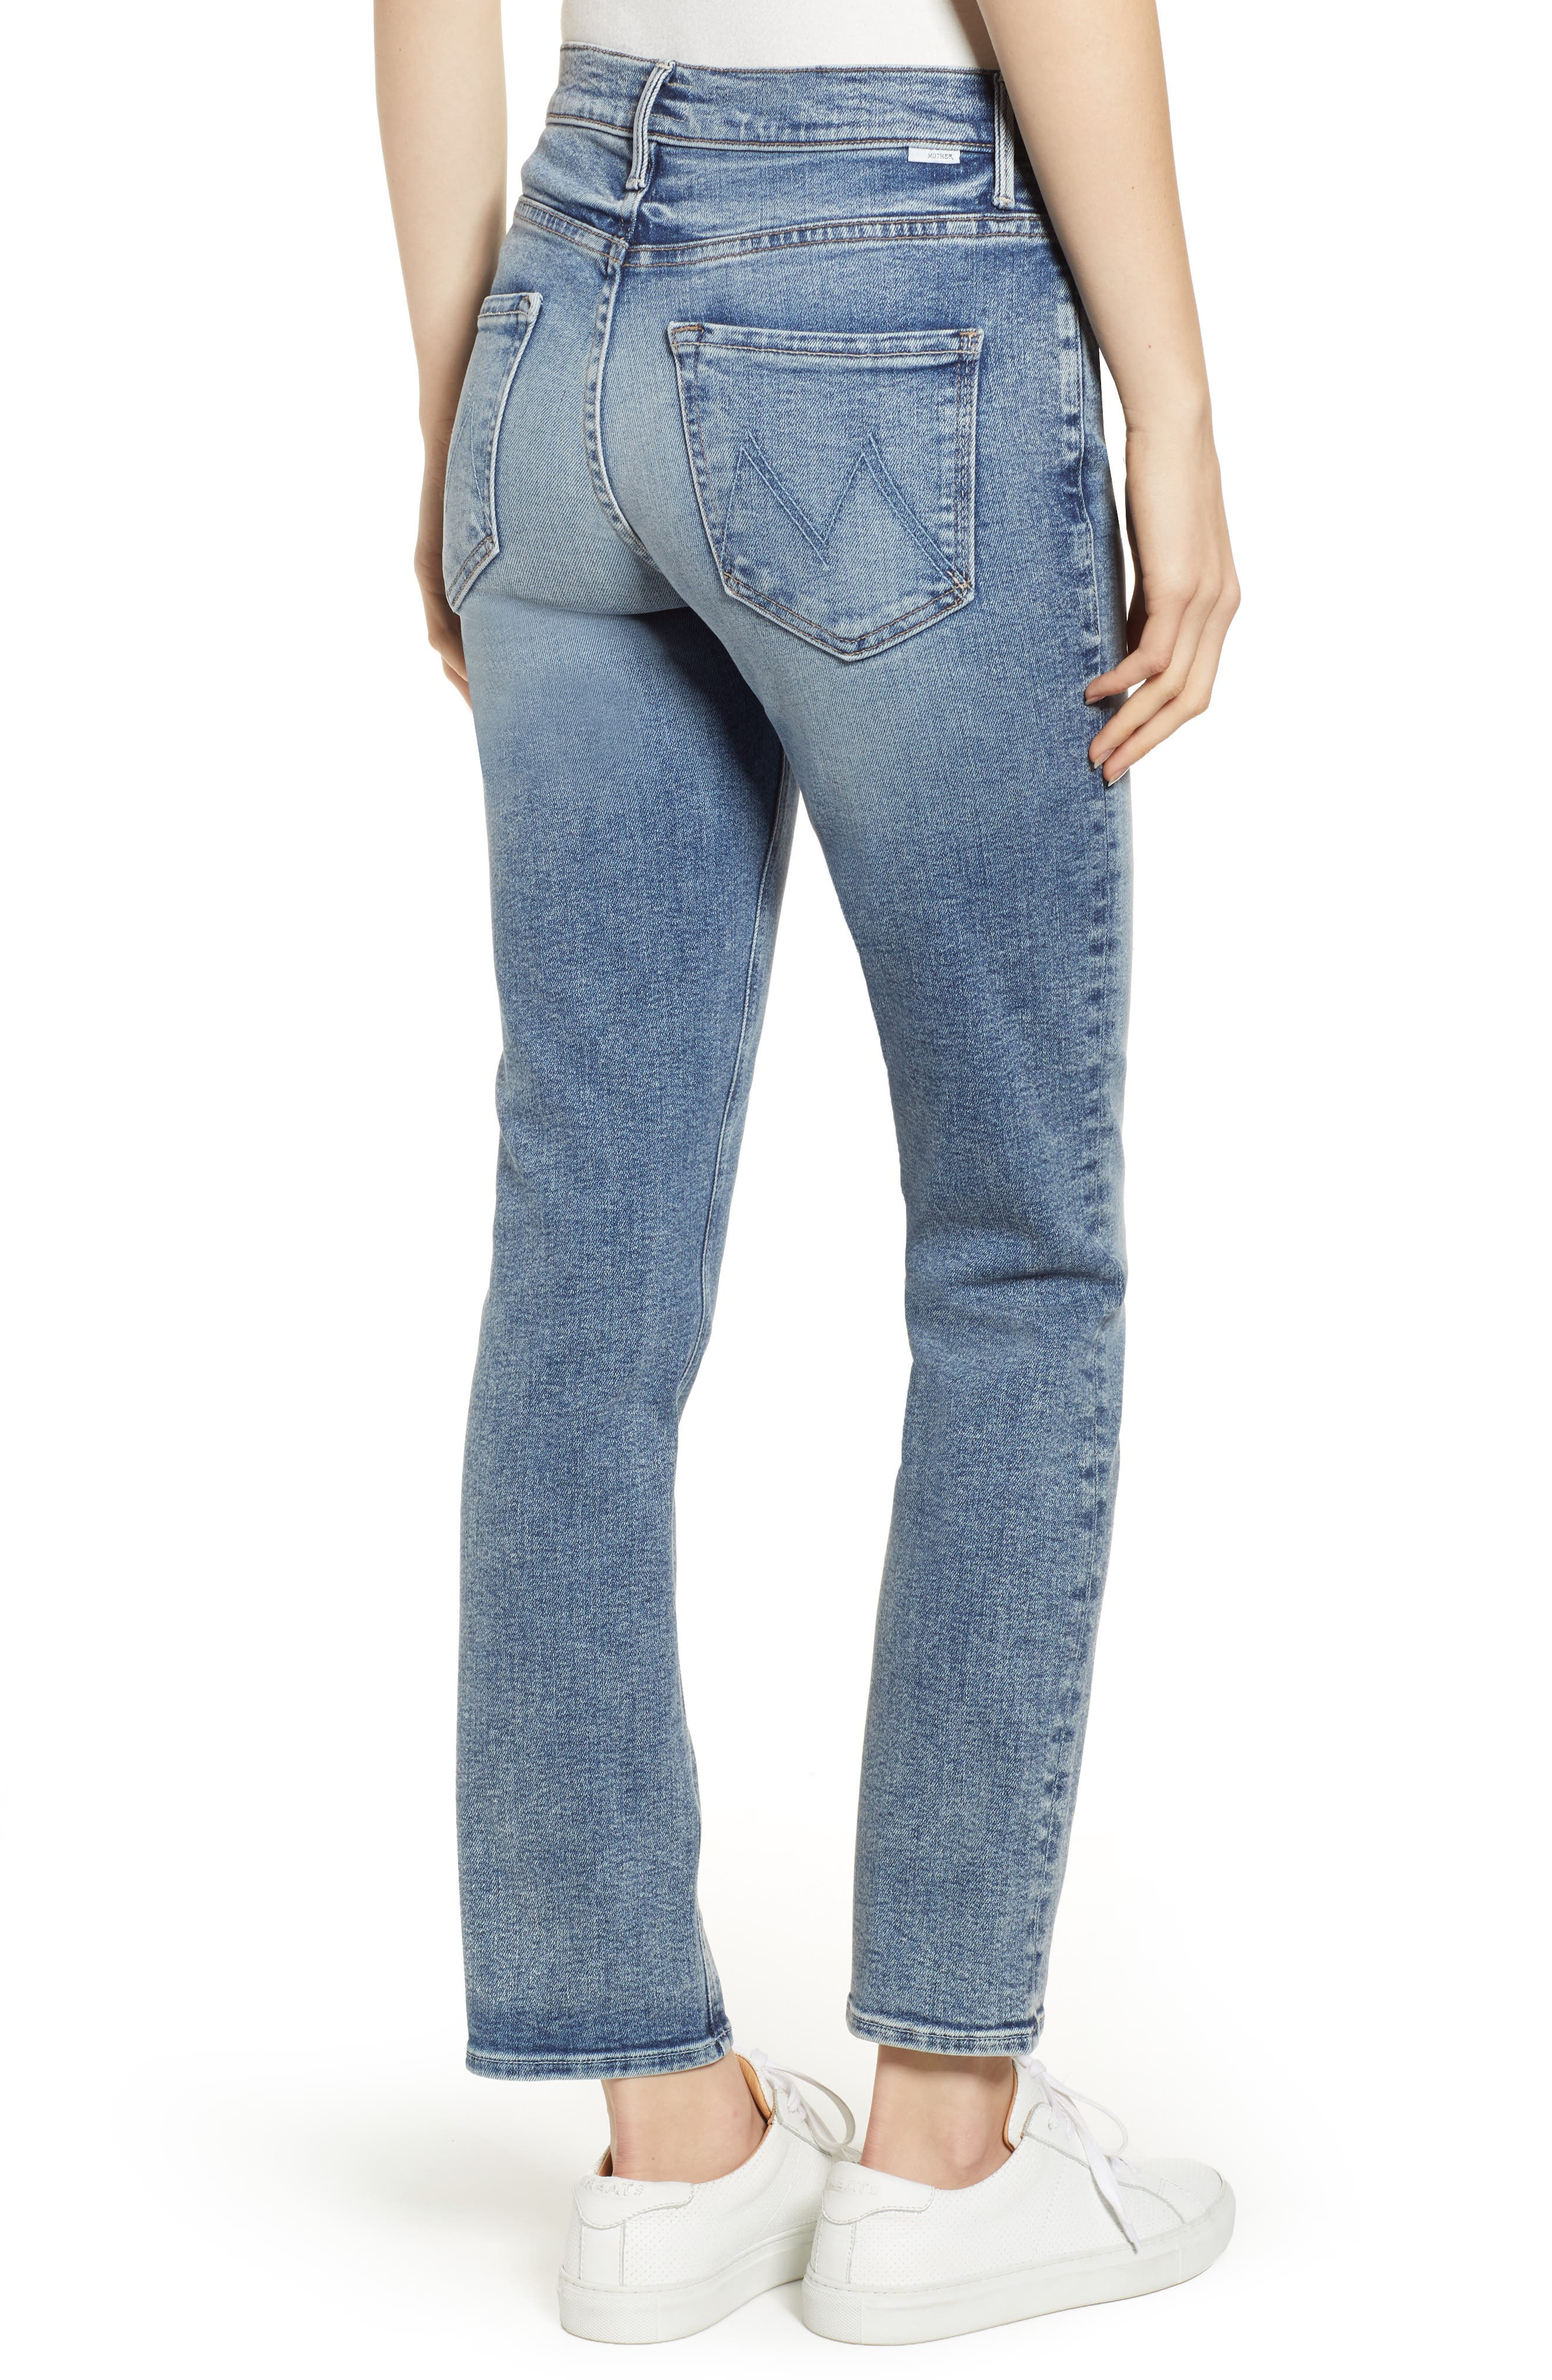 MOTHER, Dazzler High Waist Ankle Straight Leg Jeans, Alternate thumbnail 2, color, 451